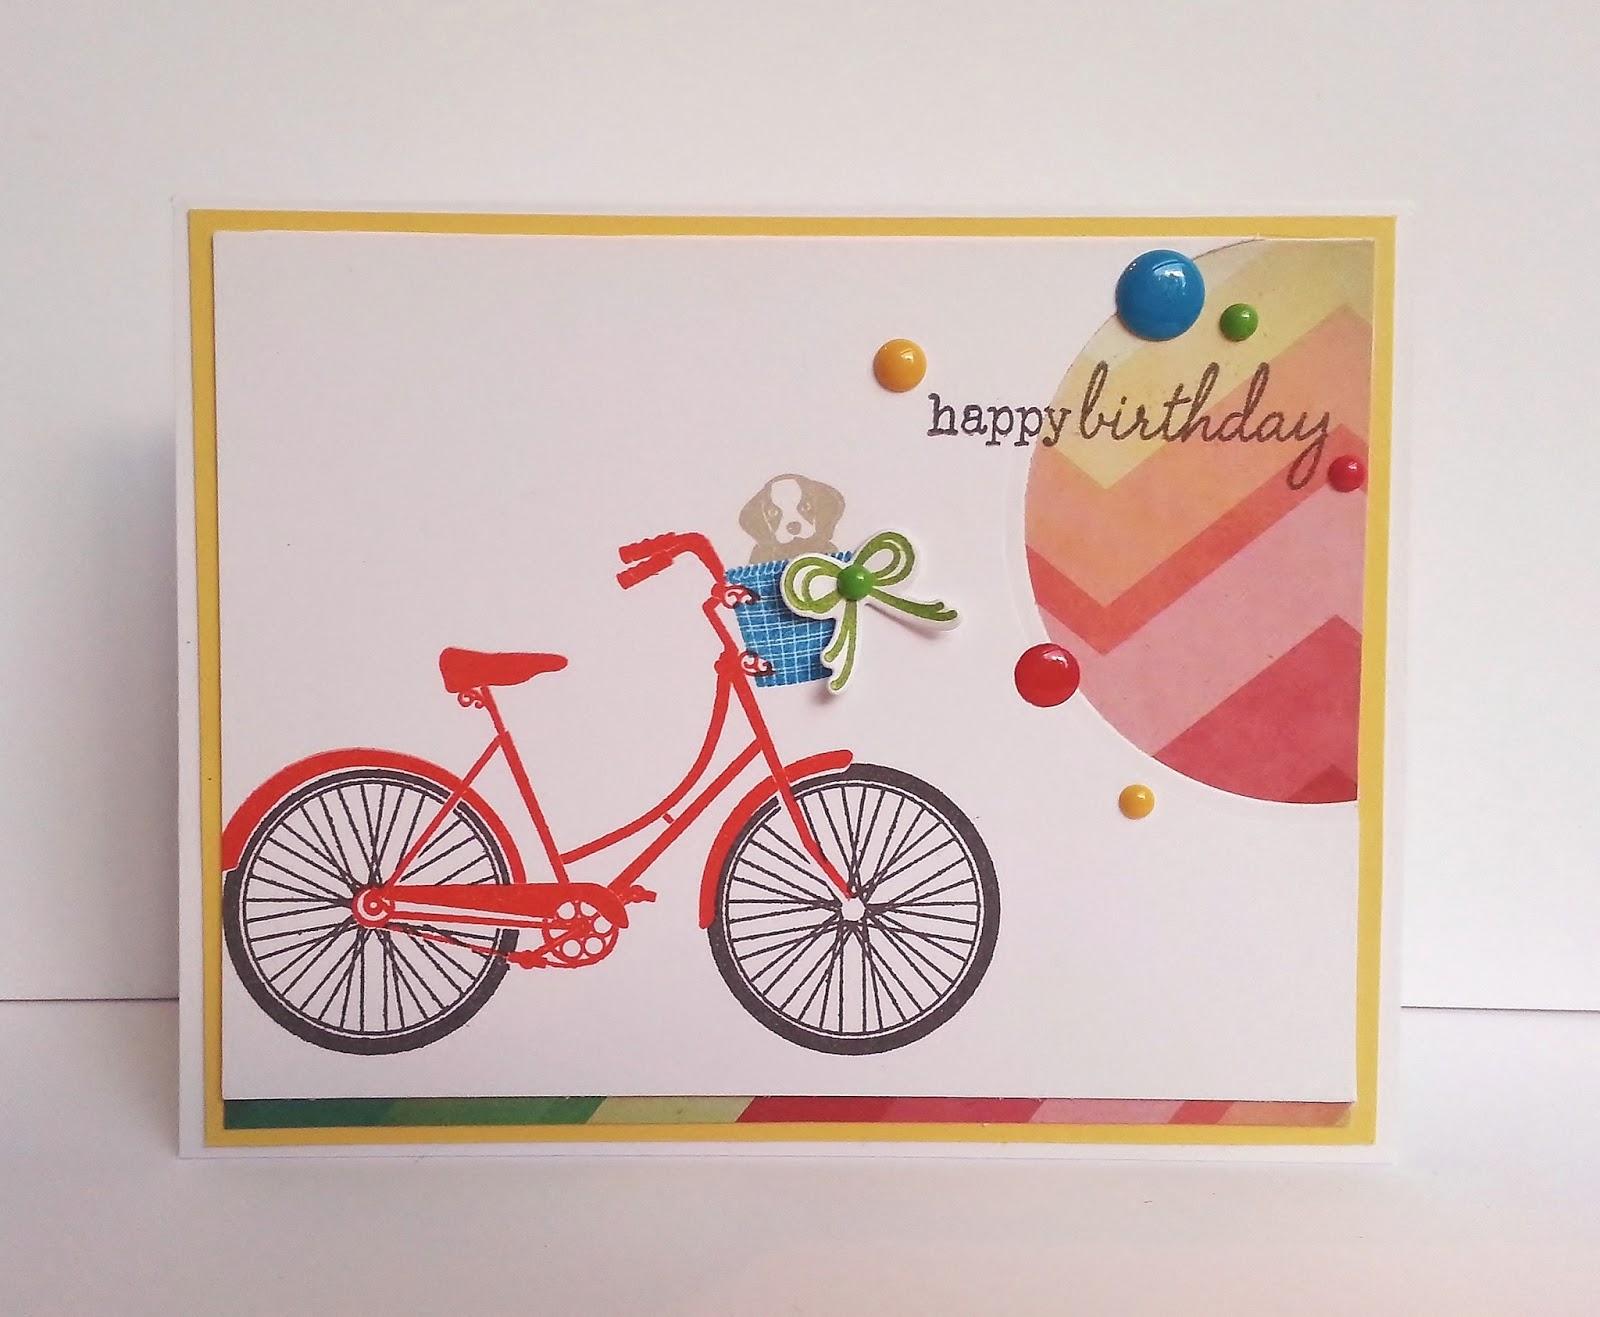 http://4.bp.blogspot.com/-UHXcQtToy84/UaHv1bwnmhI/AAAAAAAAEQ0/klujUqVdrYk/s1600/Birthday+Bike+1.jpg